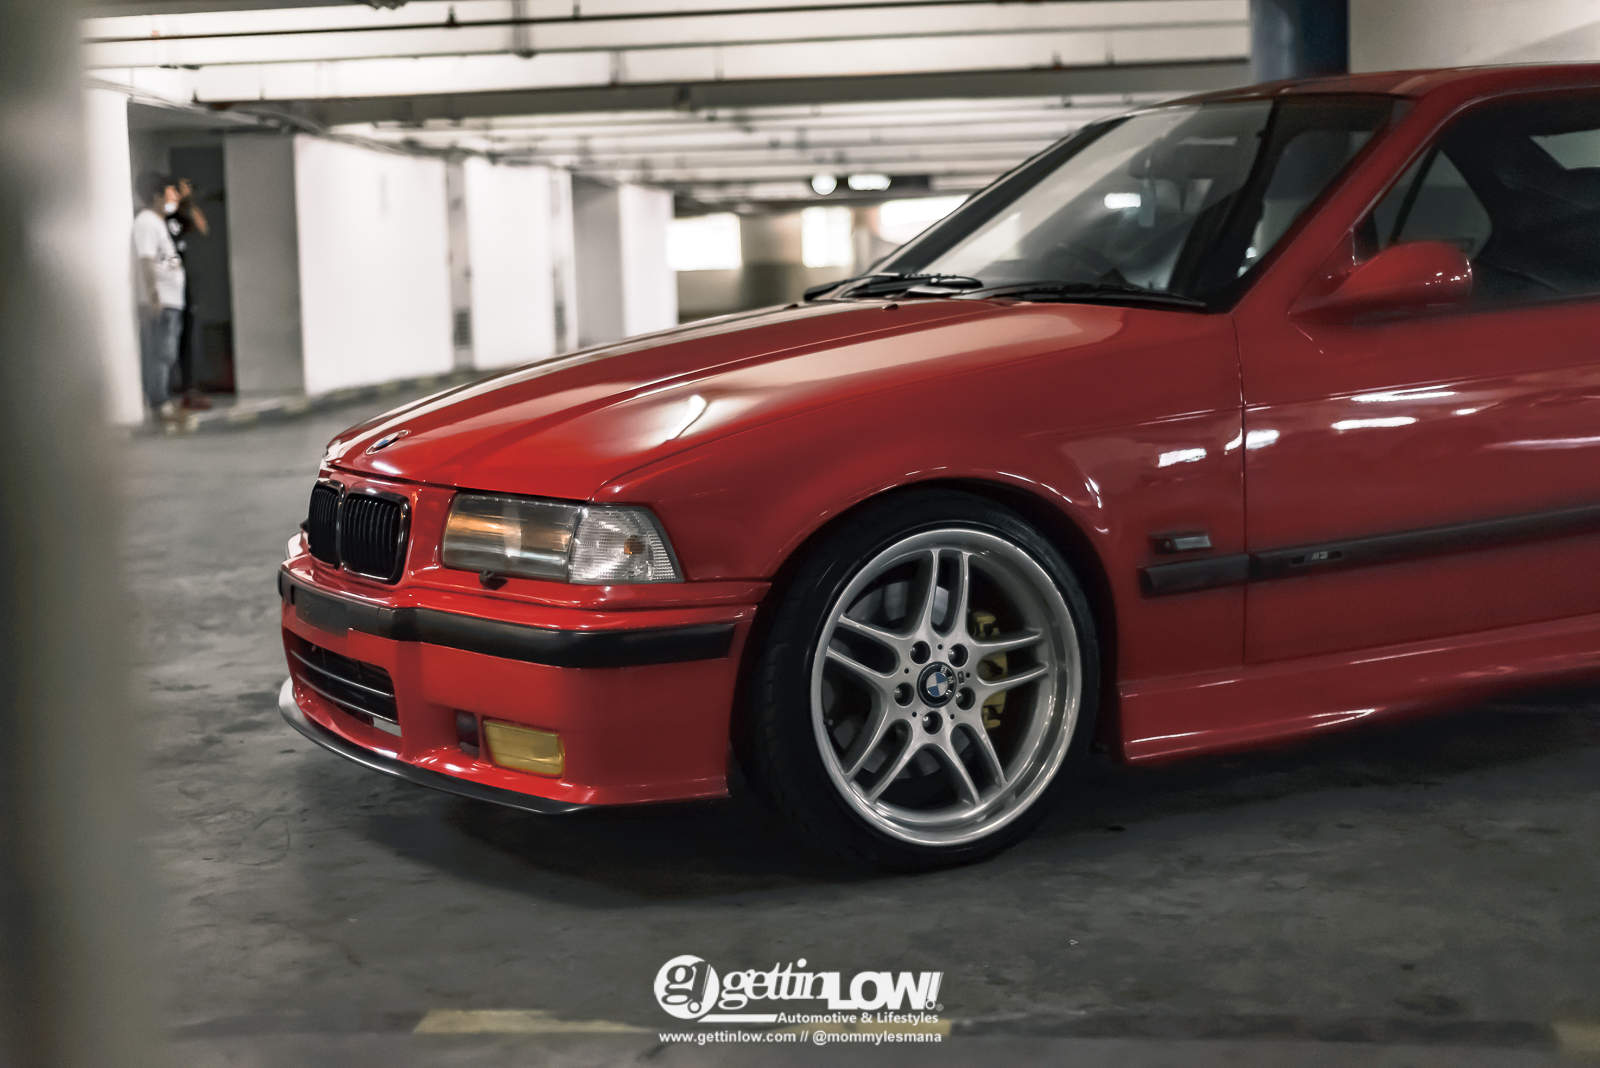 LFD17-BMW-E36-RED